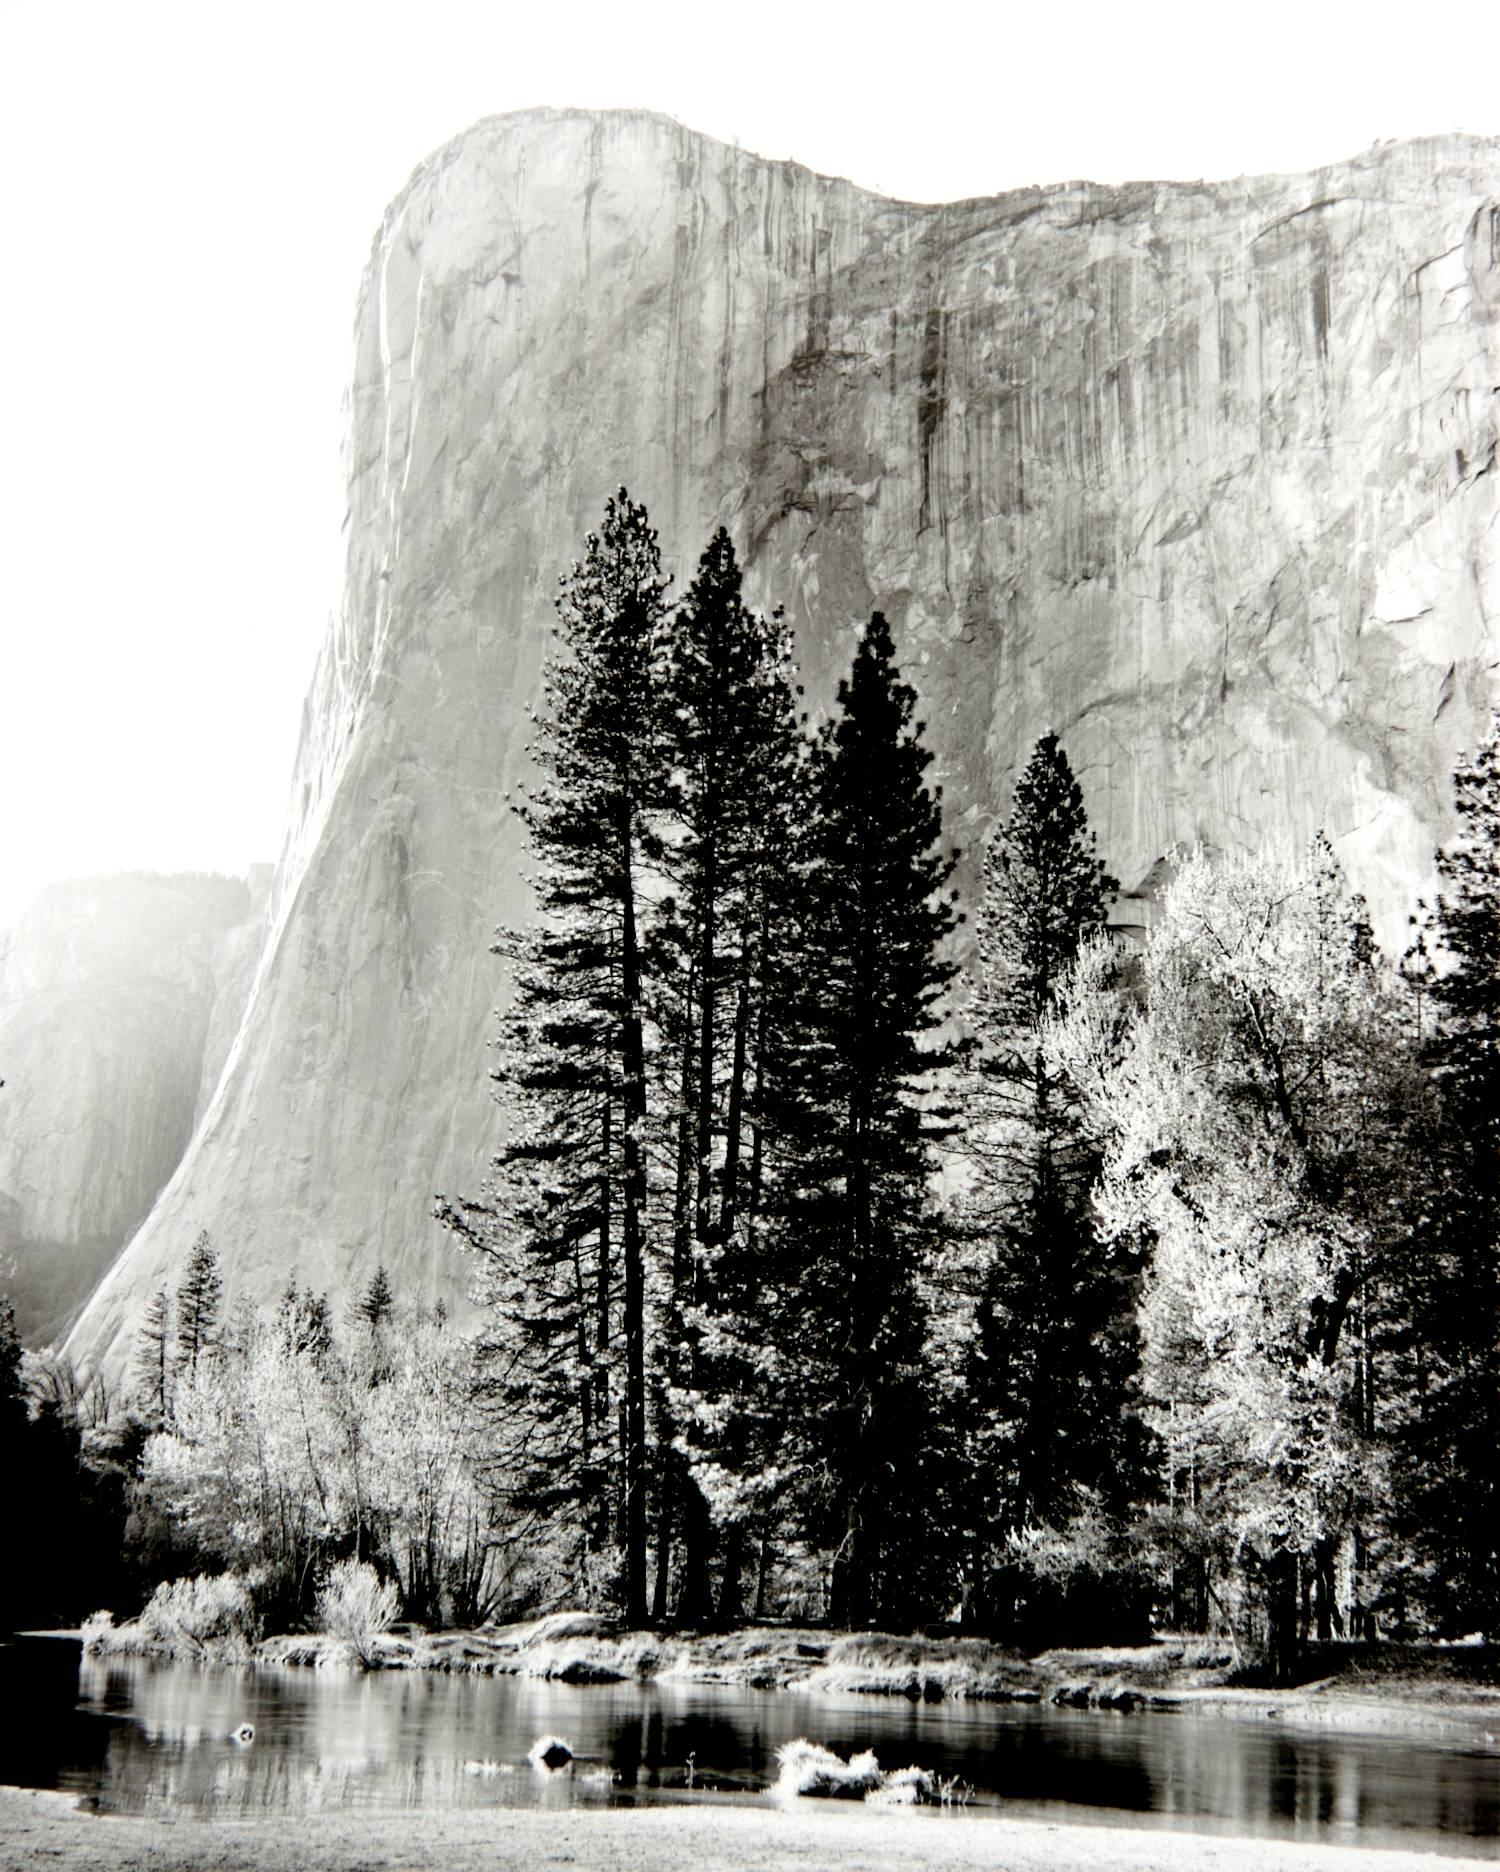 Merced River & El Capitan (Yosemite National Park)